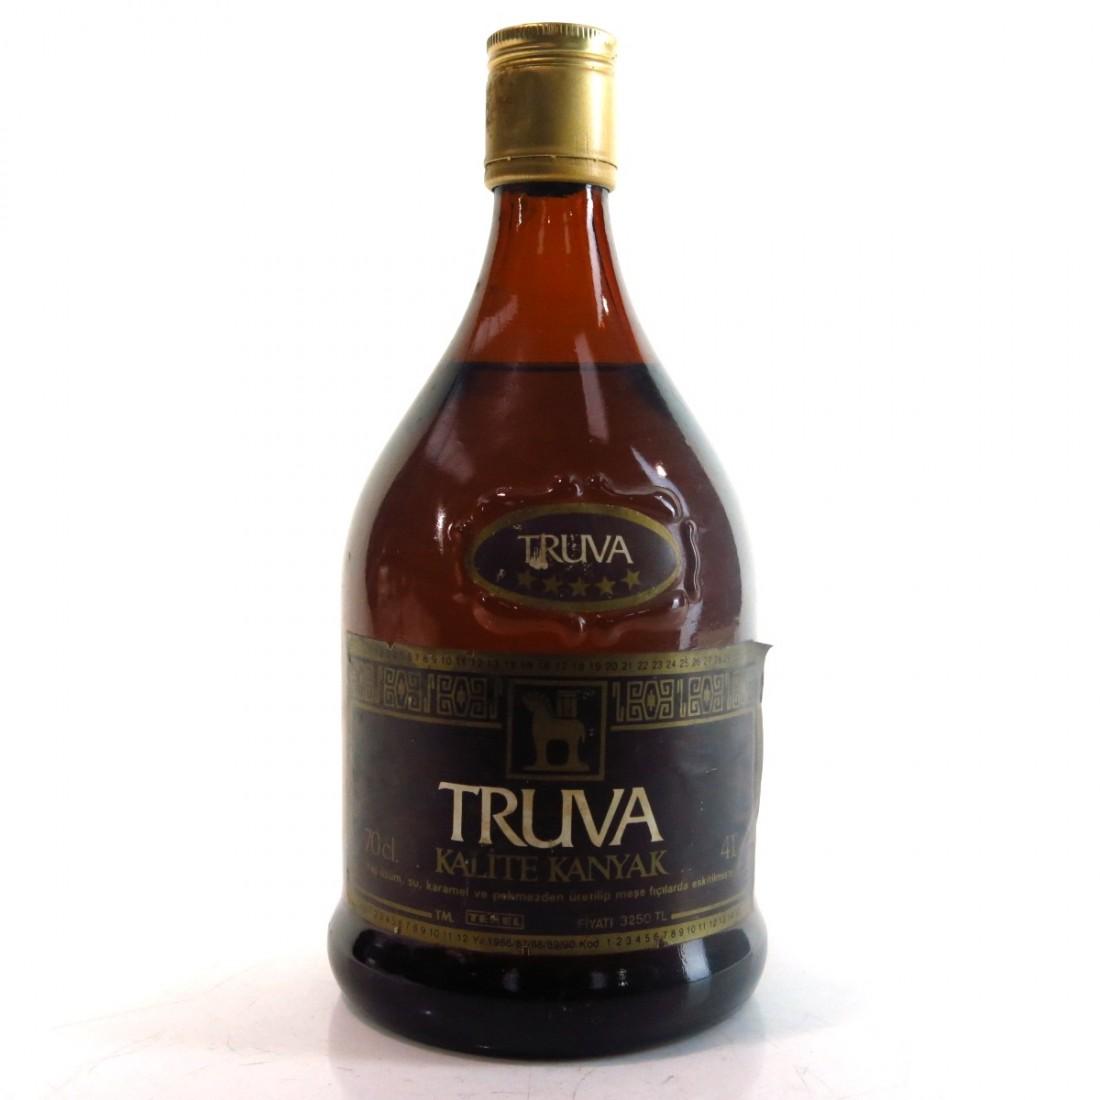 Truva Kalite Kanyak Brandy